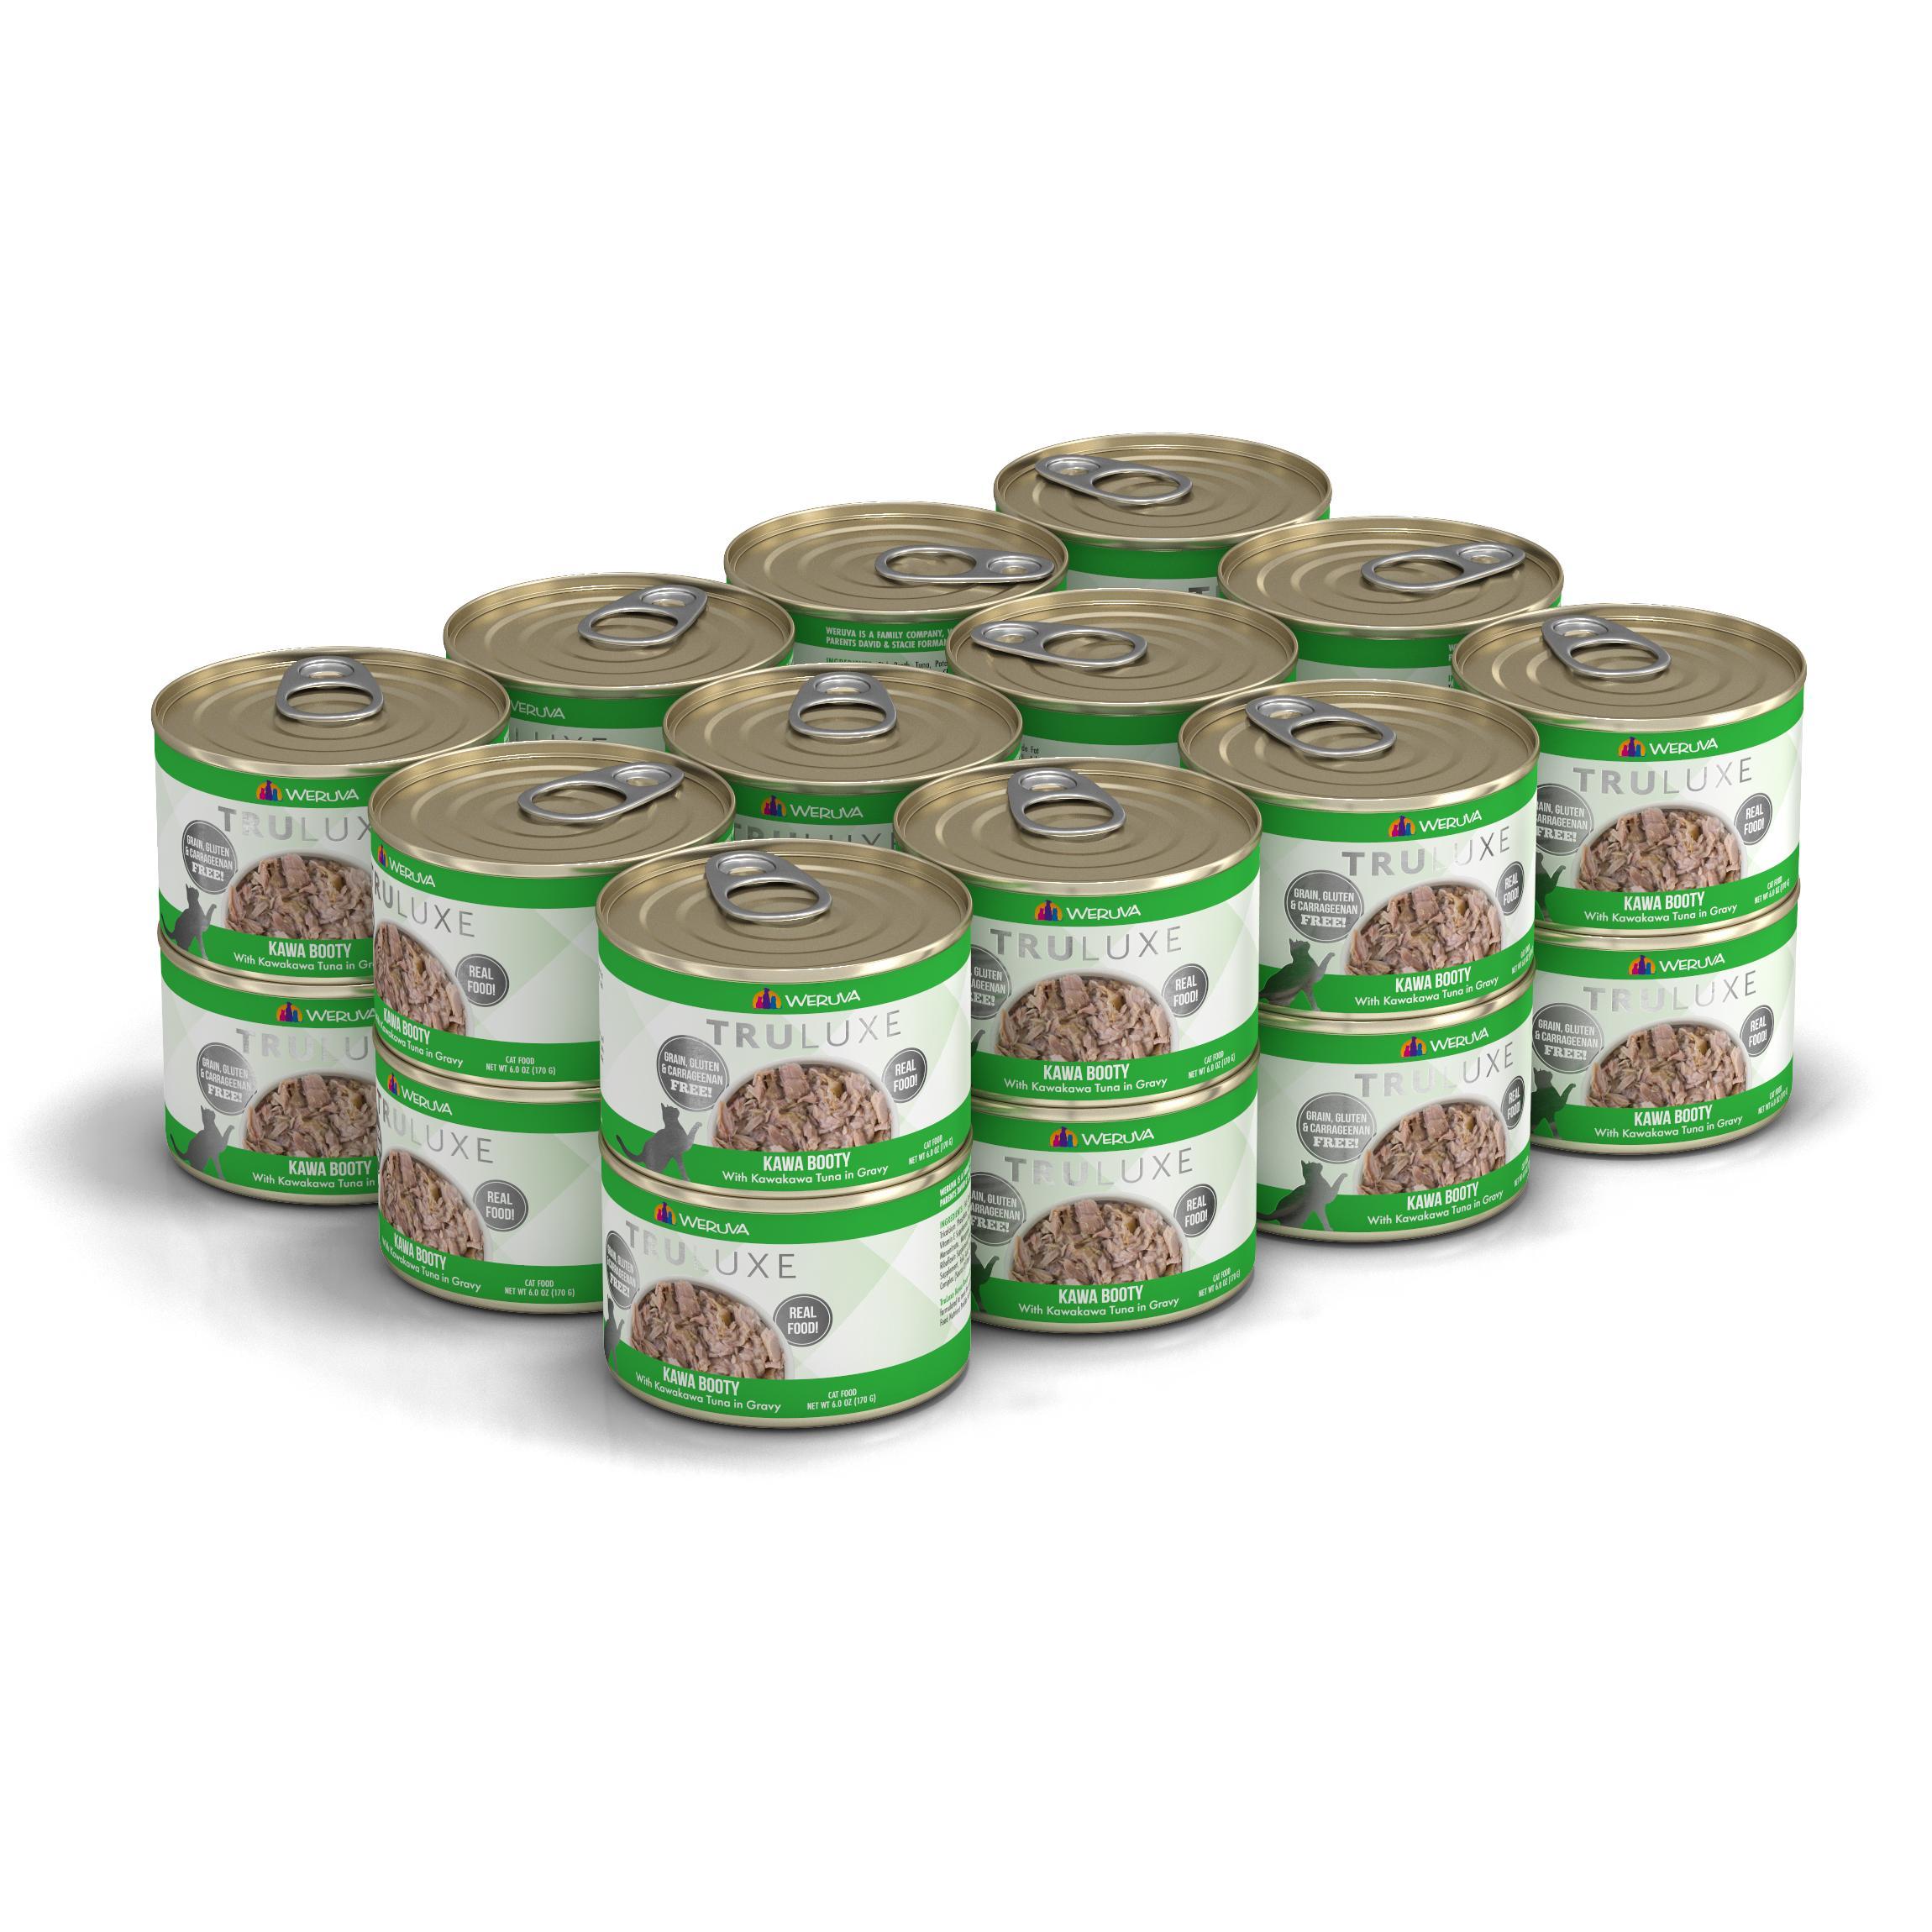 Weruva Cat Truluxe Kawa Booty with Kawakawa Tuna in Gravy Grain-Free Wet Cat Food, 6-oz, case of 24